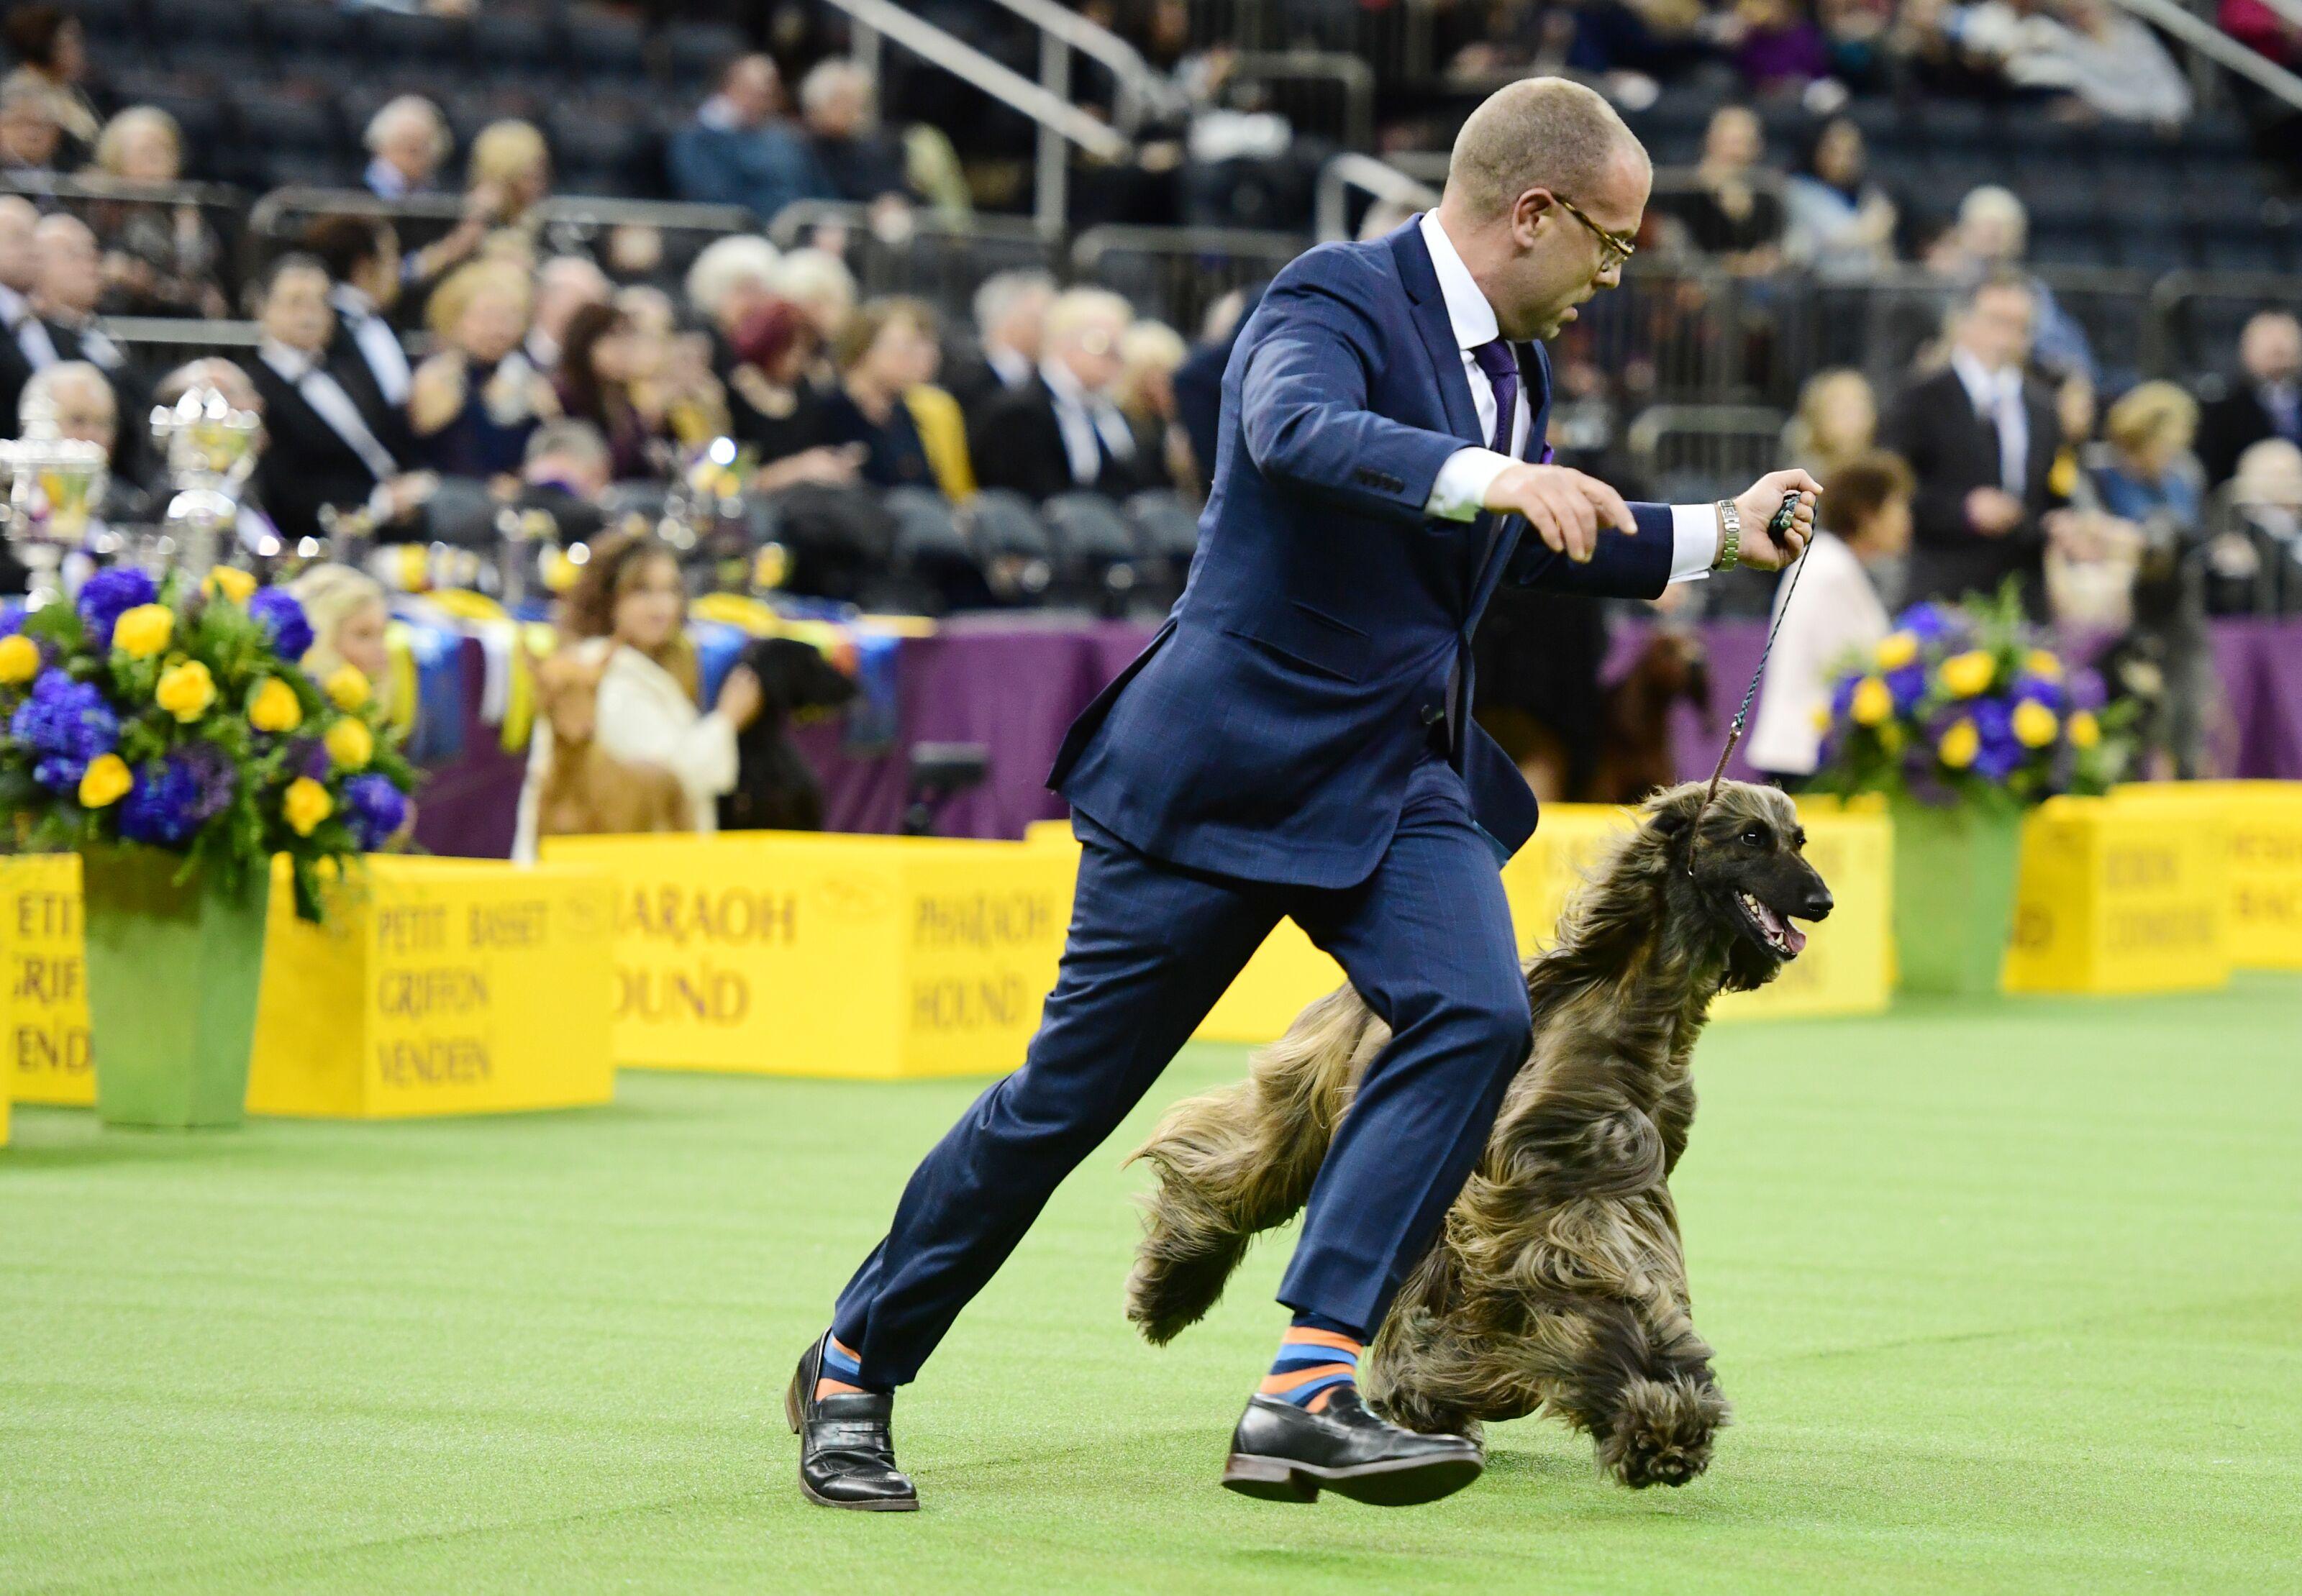 2019 Lawton Dog Fanciers Association Dog Show results